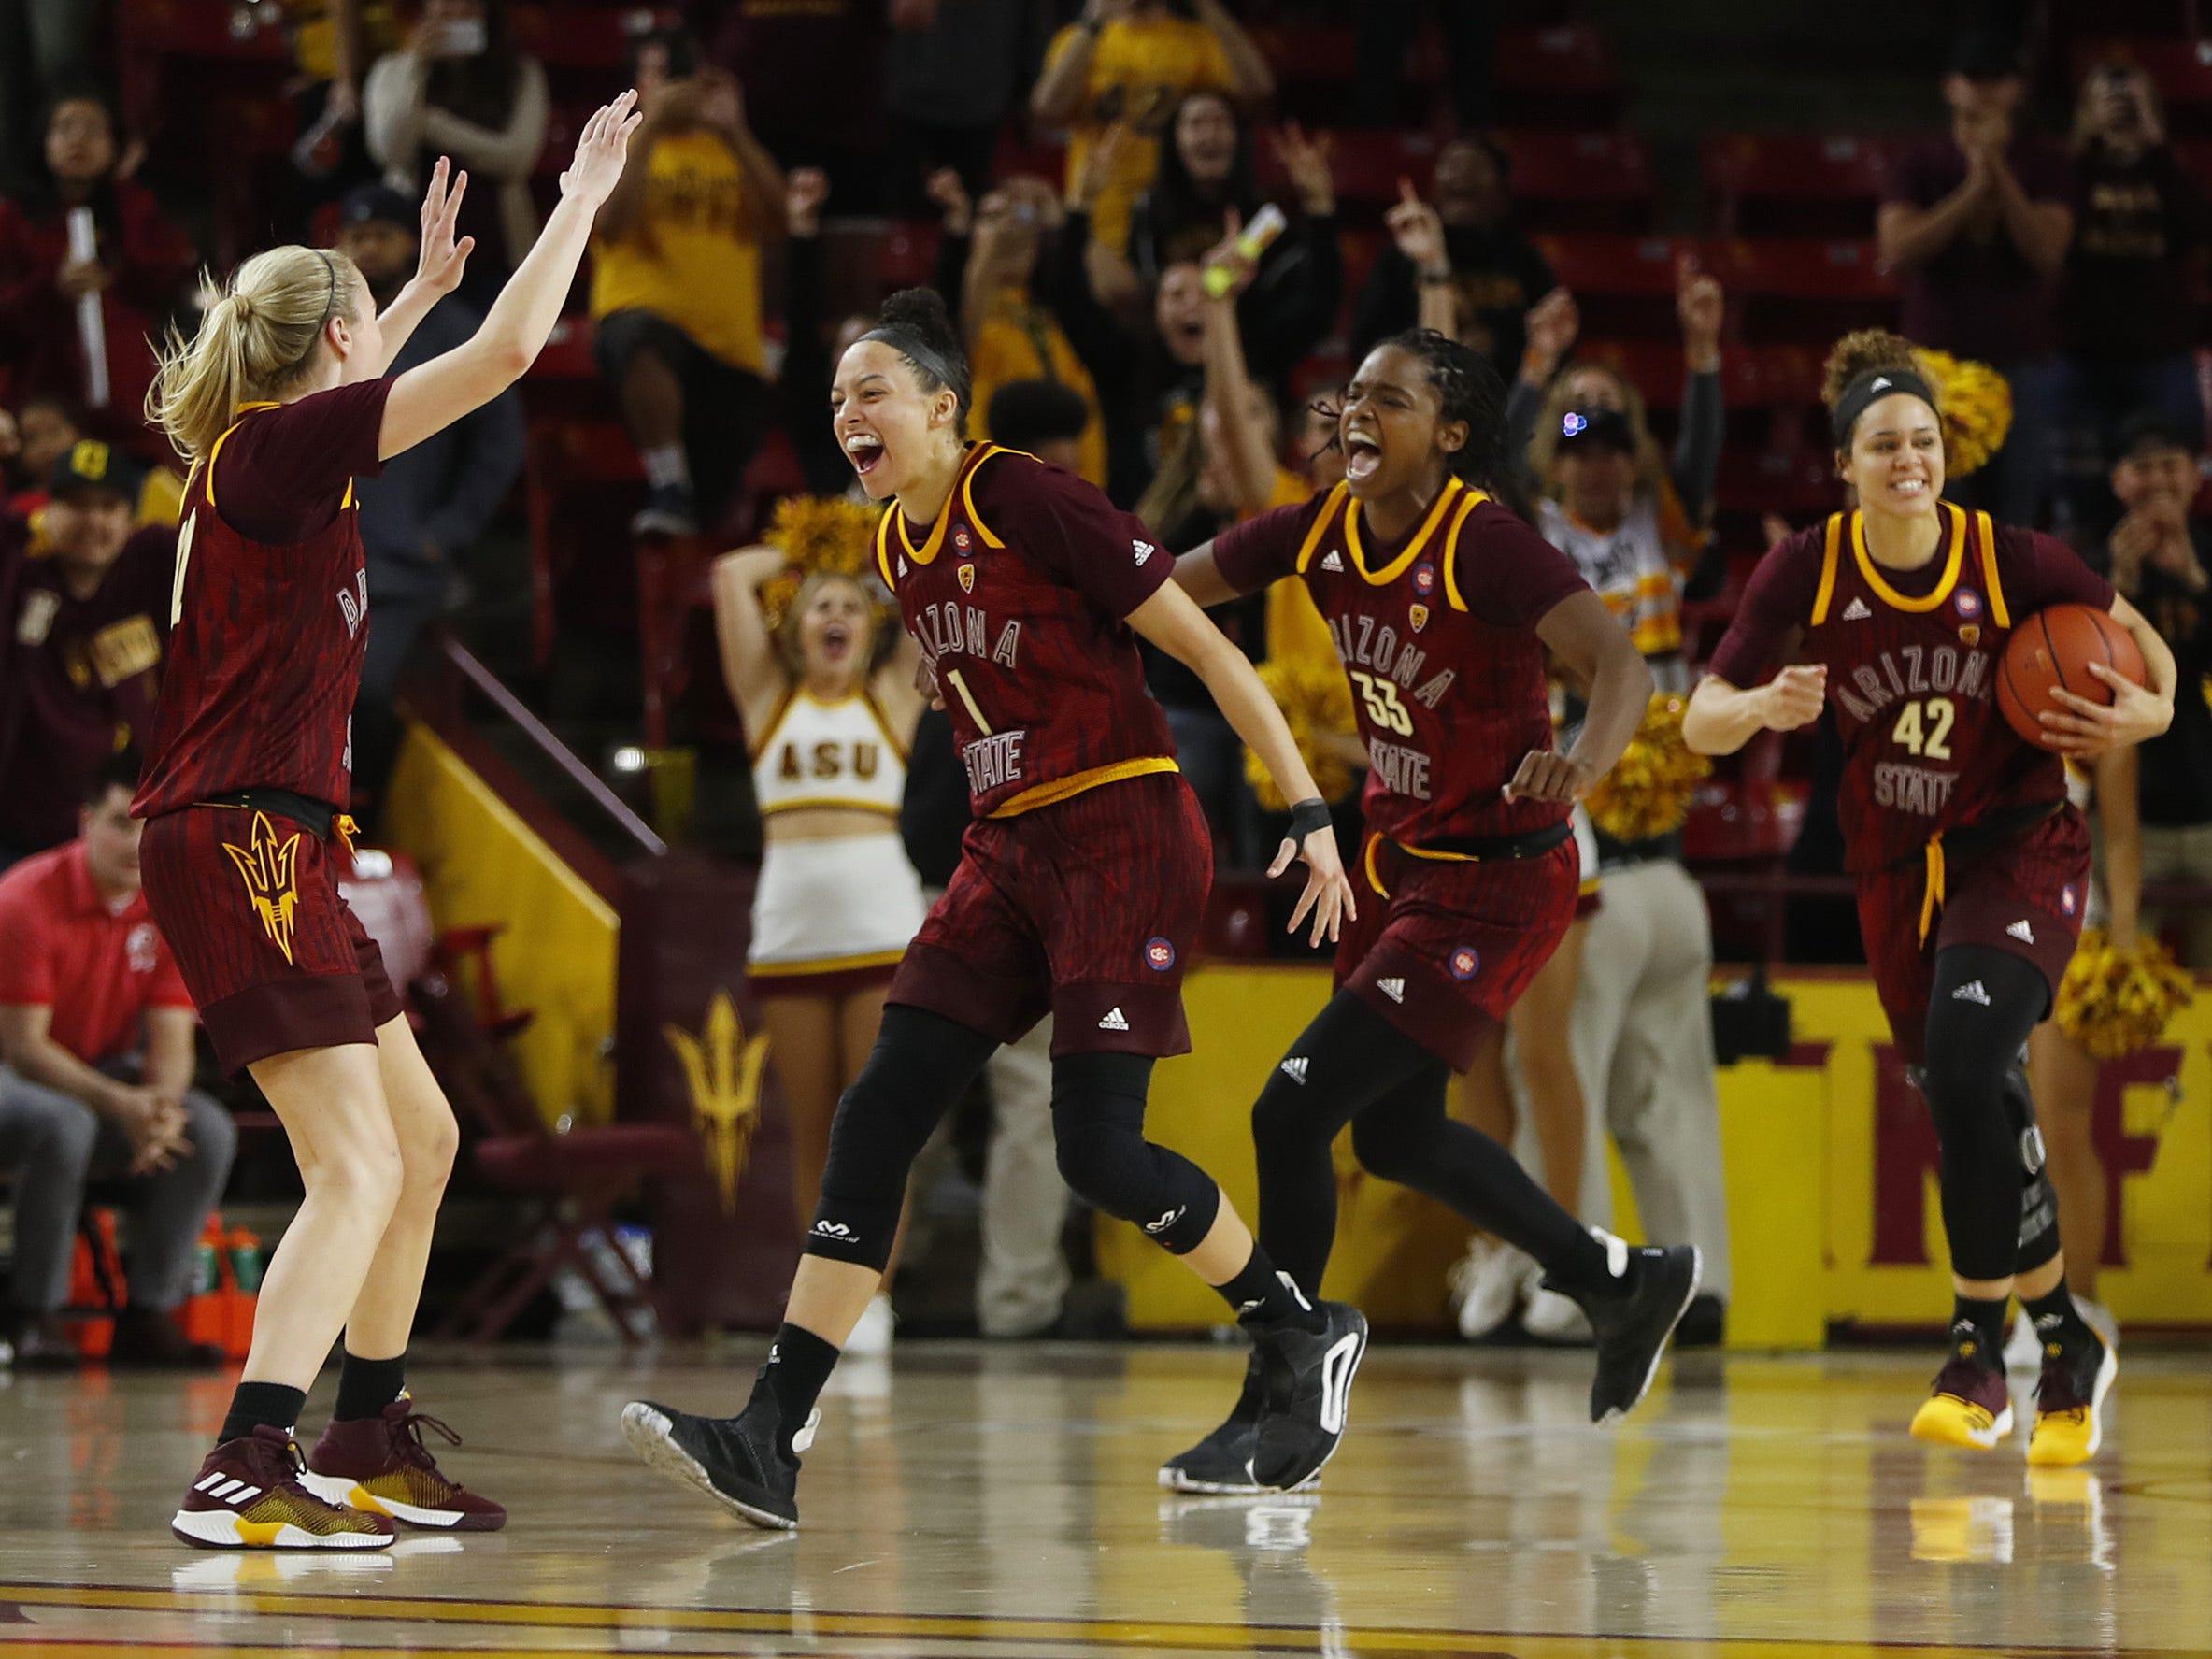 ASU's Reili Richardson (1), Courtney Ekmark (22), Kianna Ibis (42) and Charnea Johnson-Chapman (33) celebrate a come-from-behind win over Utah at Wells Fargo Arena in Tempe, Ariz. on February 17, 2019.